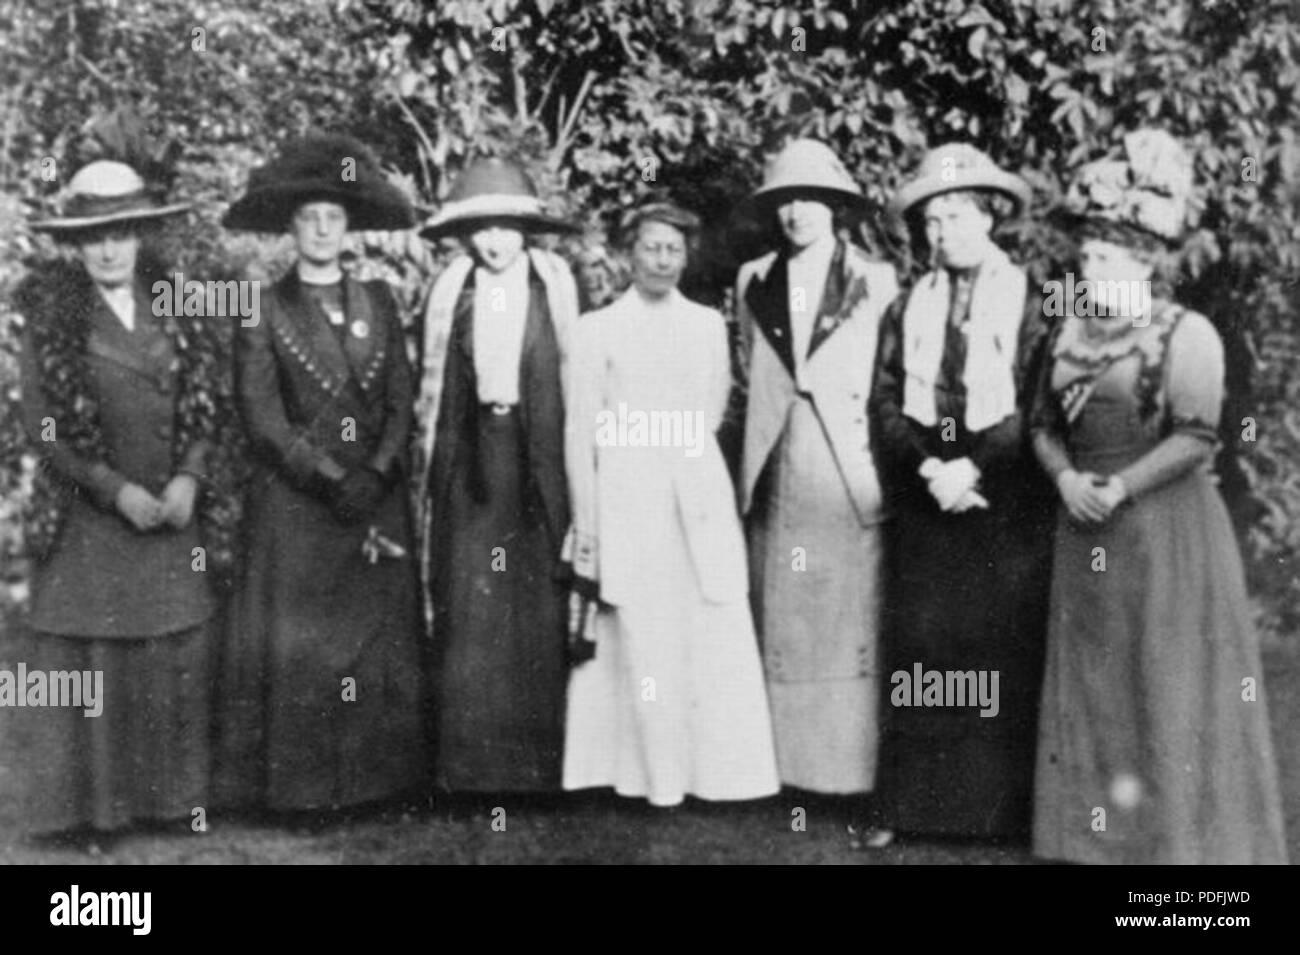 151 Helen Crawfurd, Janet Barrowman, Margaret McPhun, Sra. A.A. Wilson, Frances McPhun, Nancy A. John y Annie Swan Foto de stock